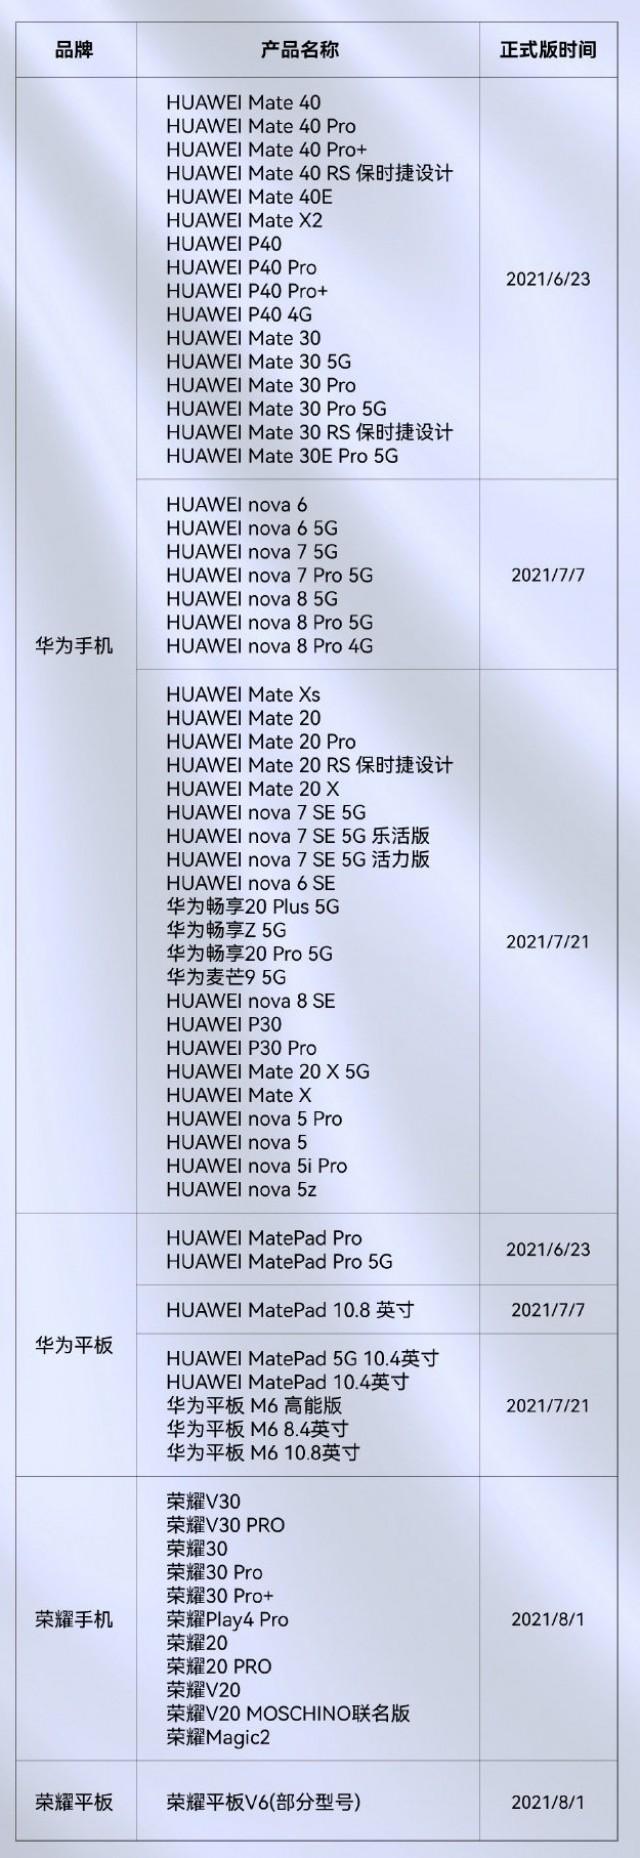 Huawei distribuire harmonyos